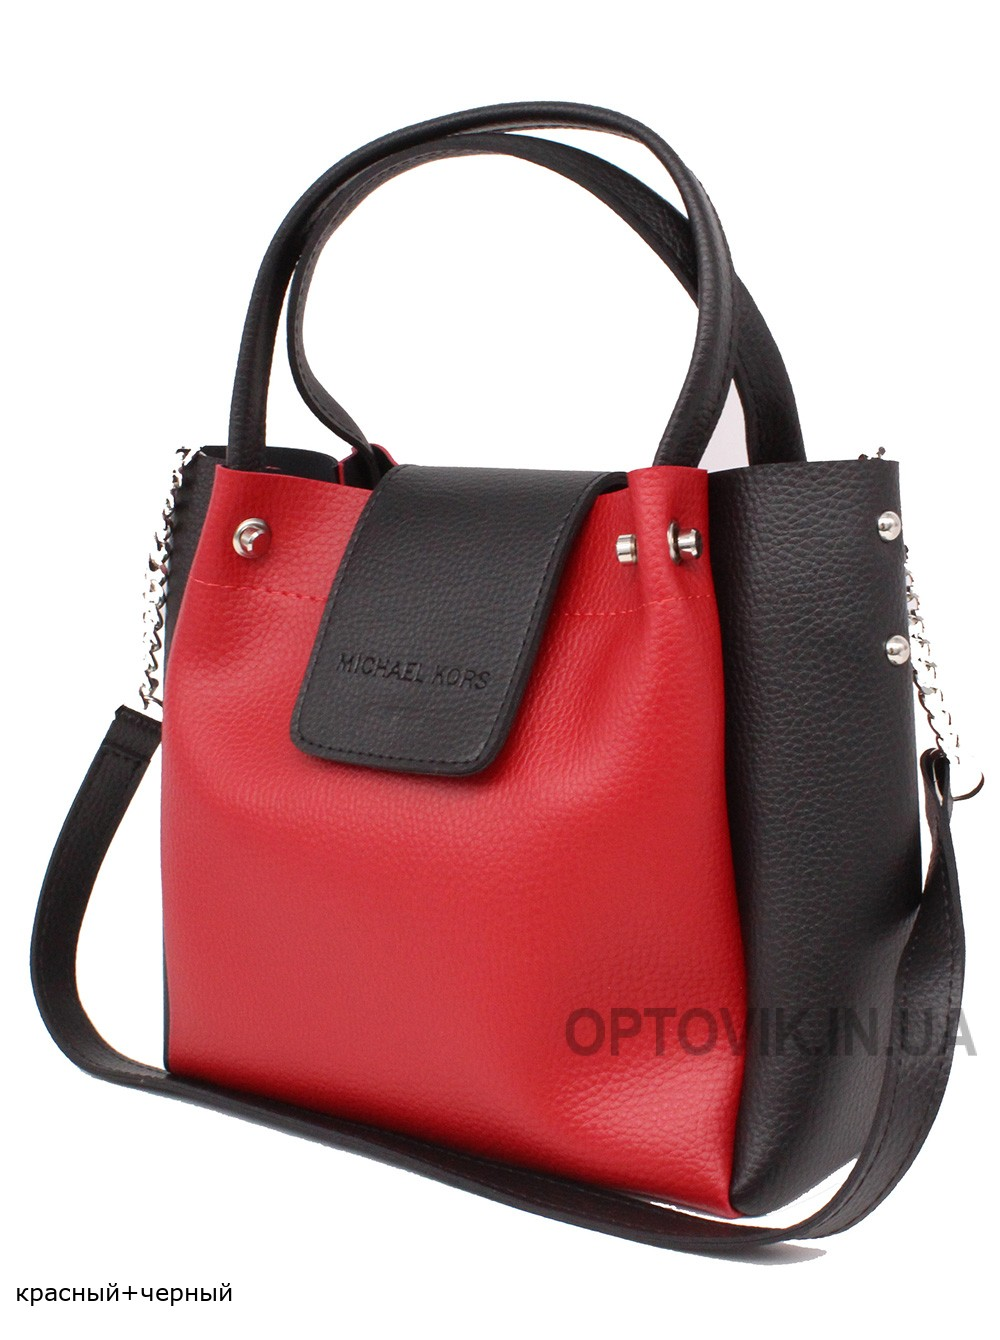 Женская модельная сумка Michael Kors кожзам 26х23х11 - Mi103-104